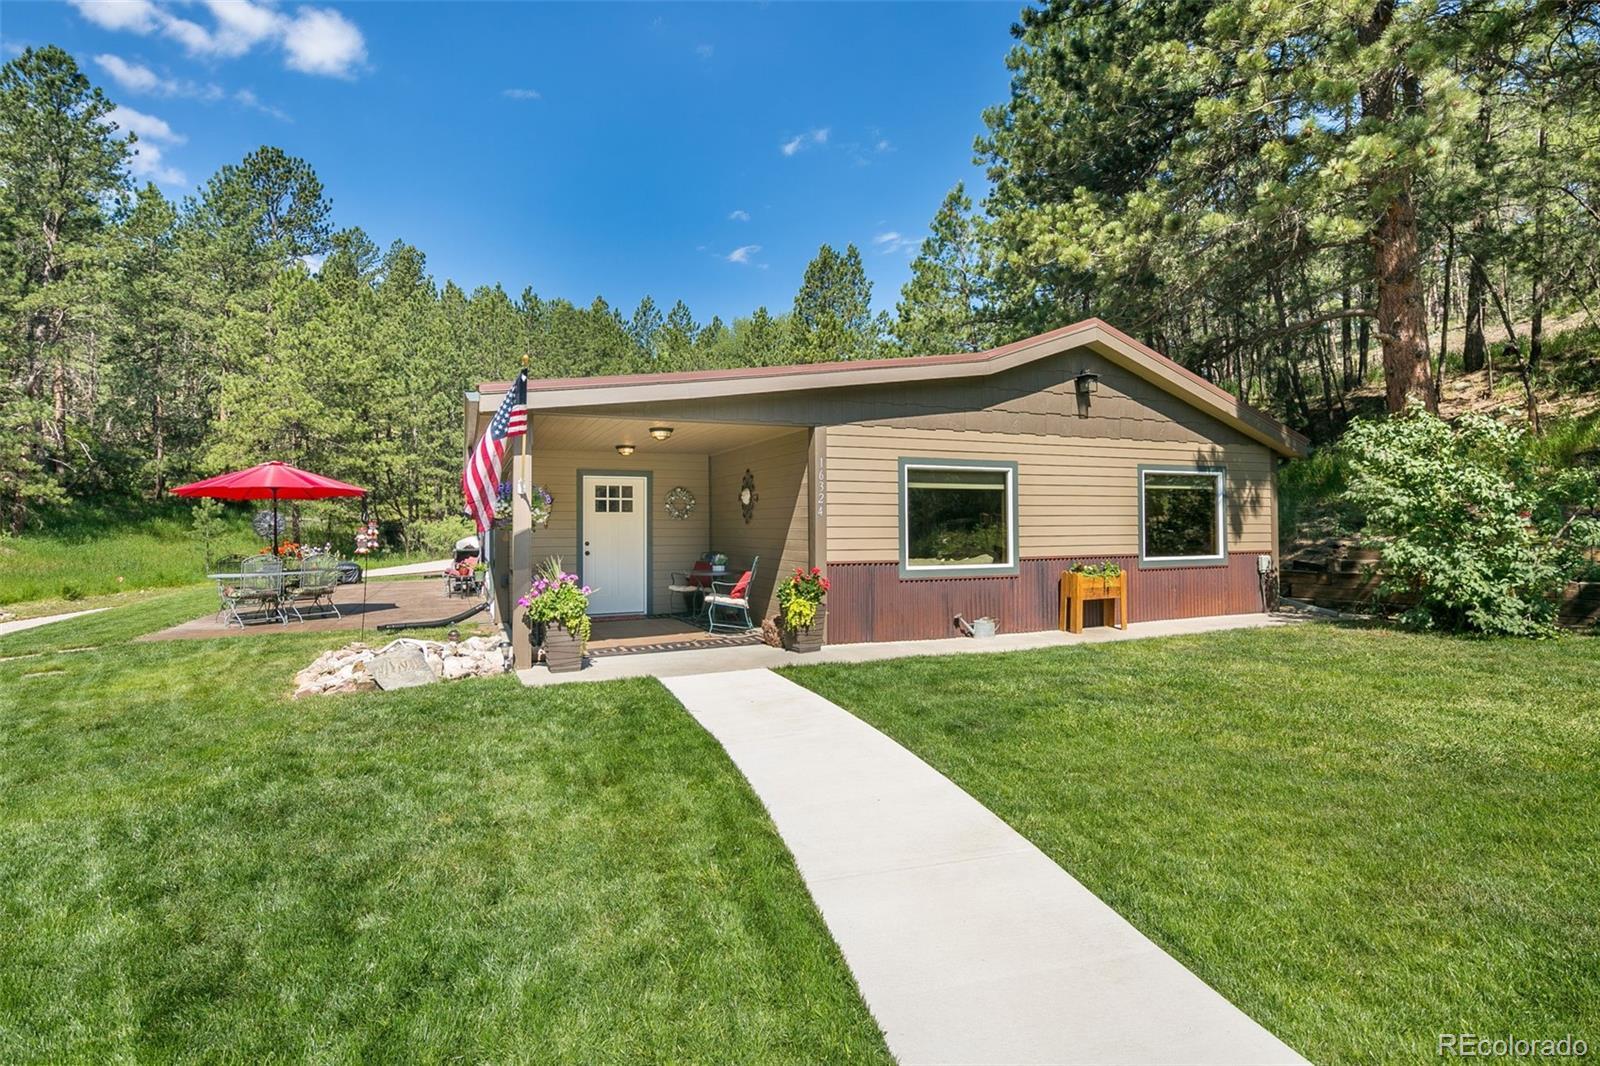 16324 W County Road 18E Property Photo - Loveland, CO real estate listing